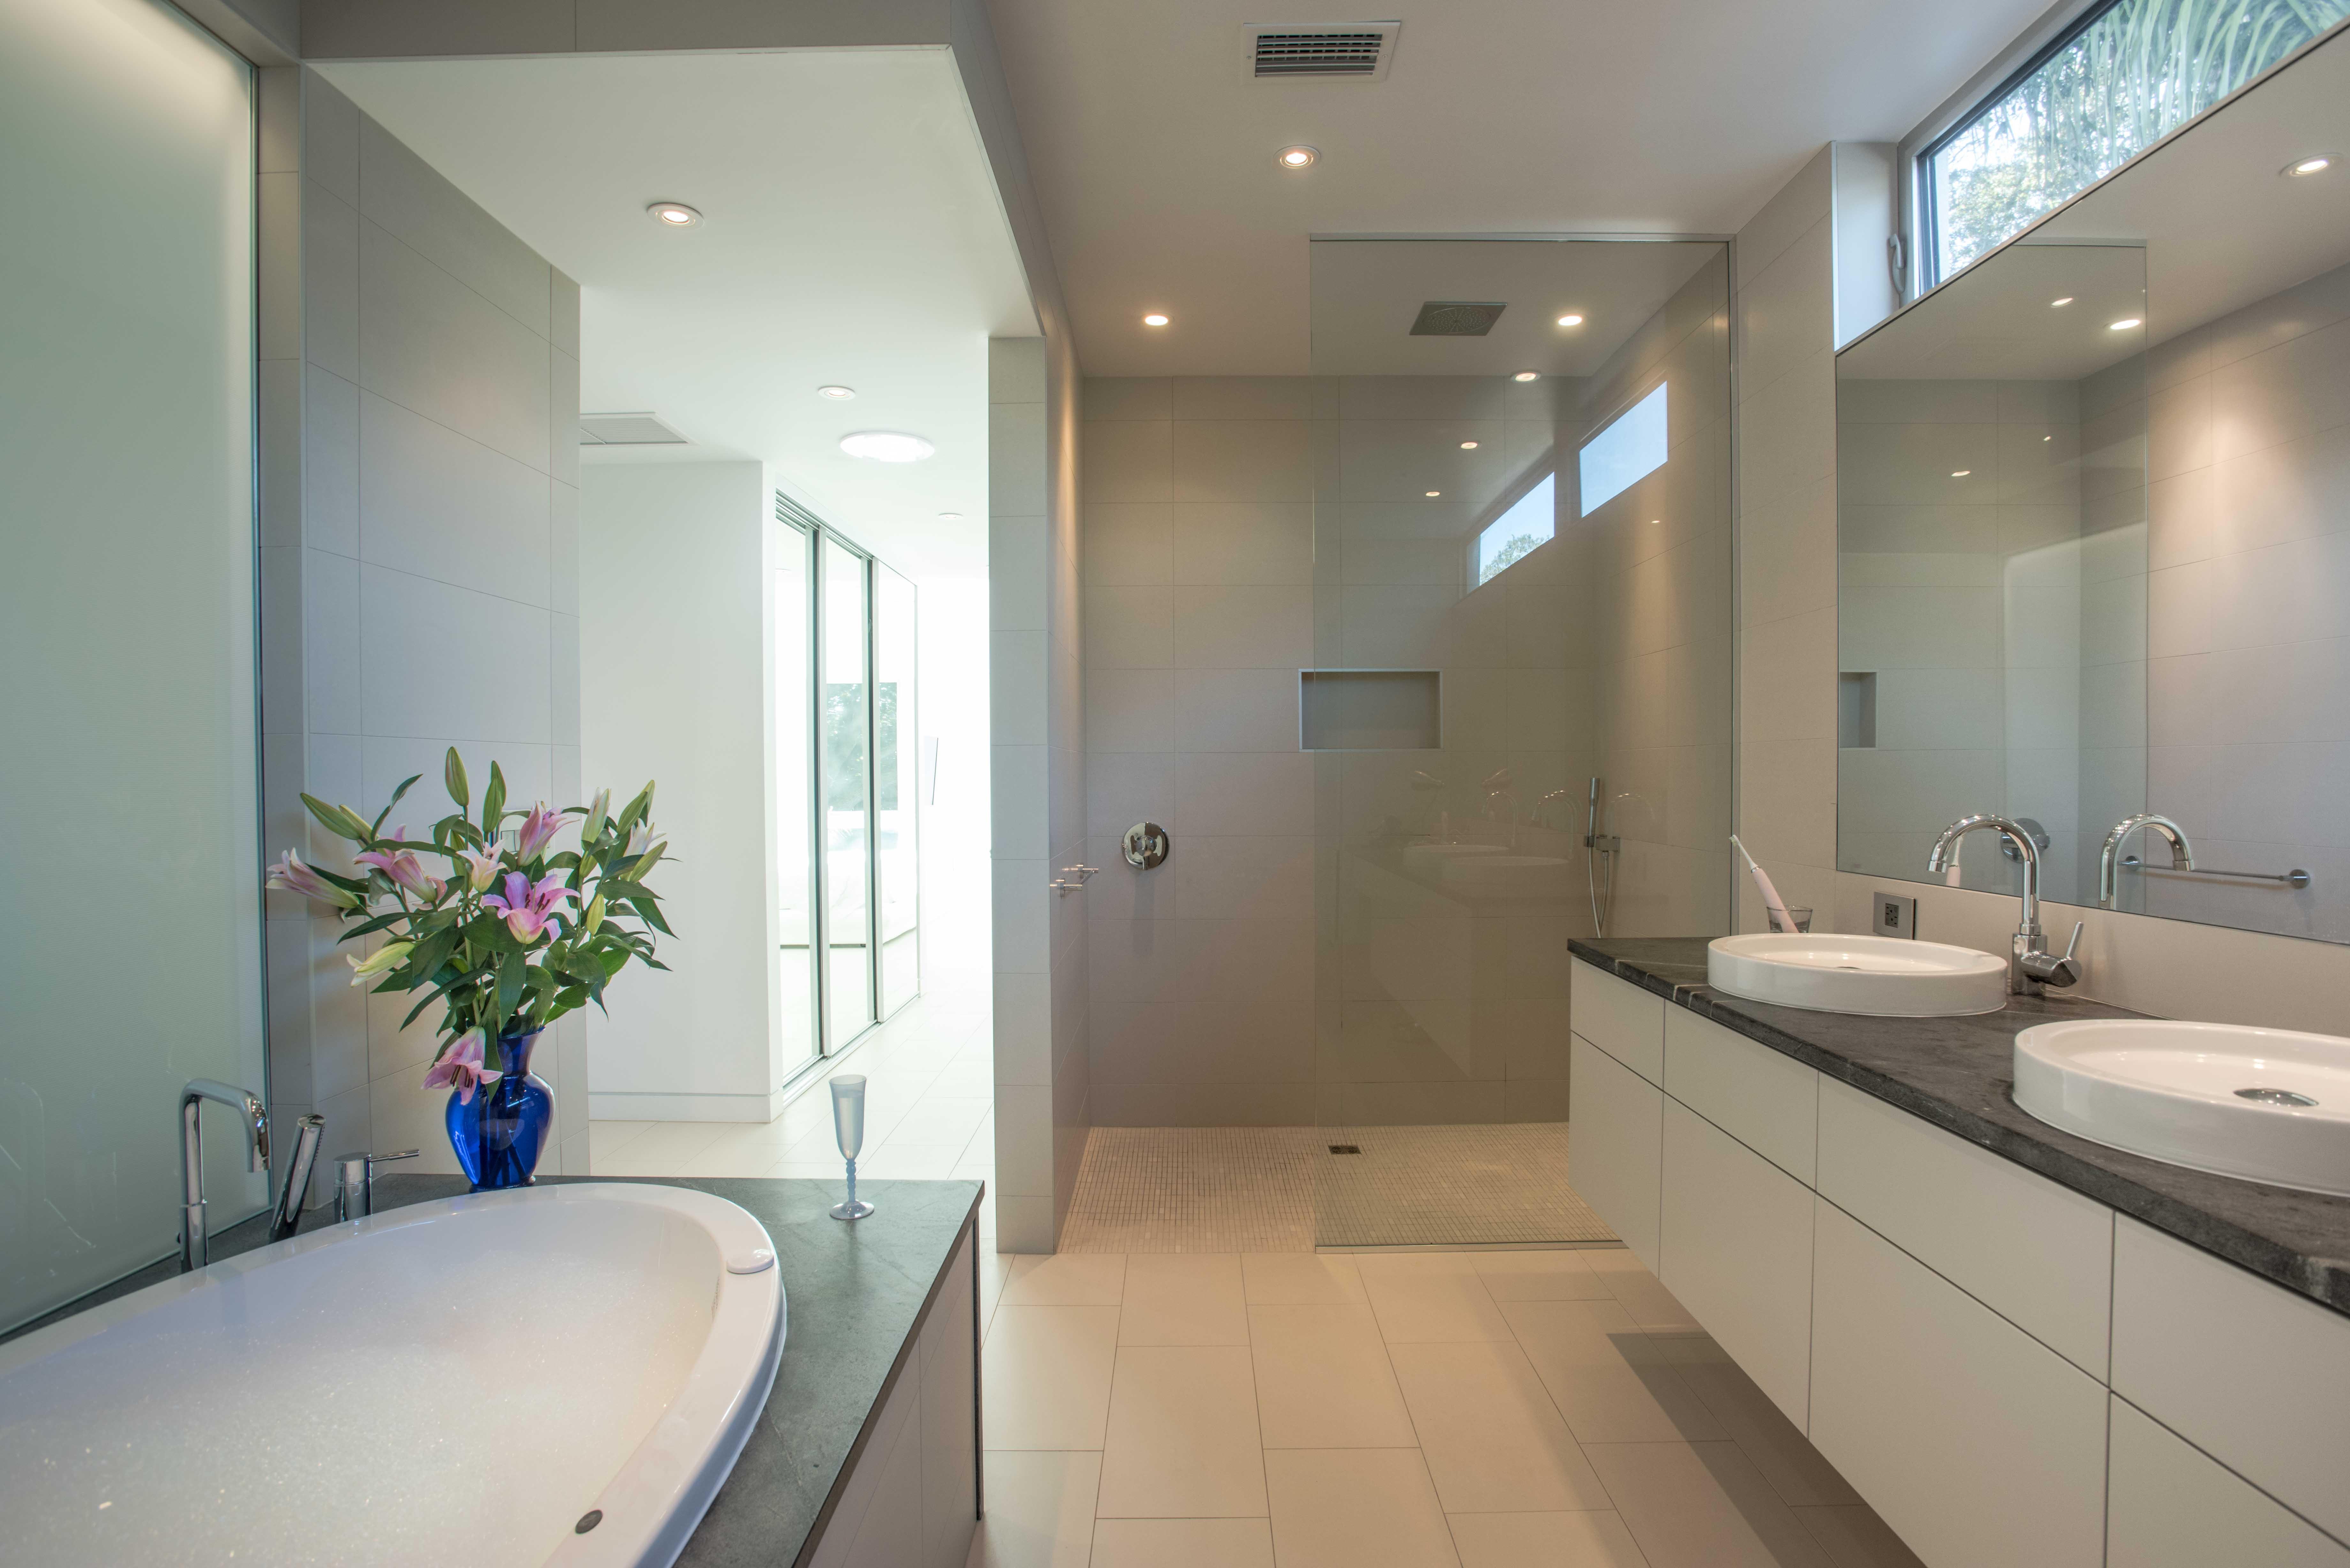 Master Bathroom, Bathroom, Architectural Design, Architectural Glazing, Architectural Photography, Architecture, Dale Parks, Dale Parks Architect, dining room, Florida, Glass Architecture, Modern Architecture, Residntial, Sarasota, Tahiti Park